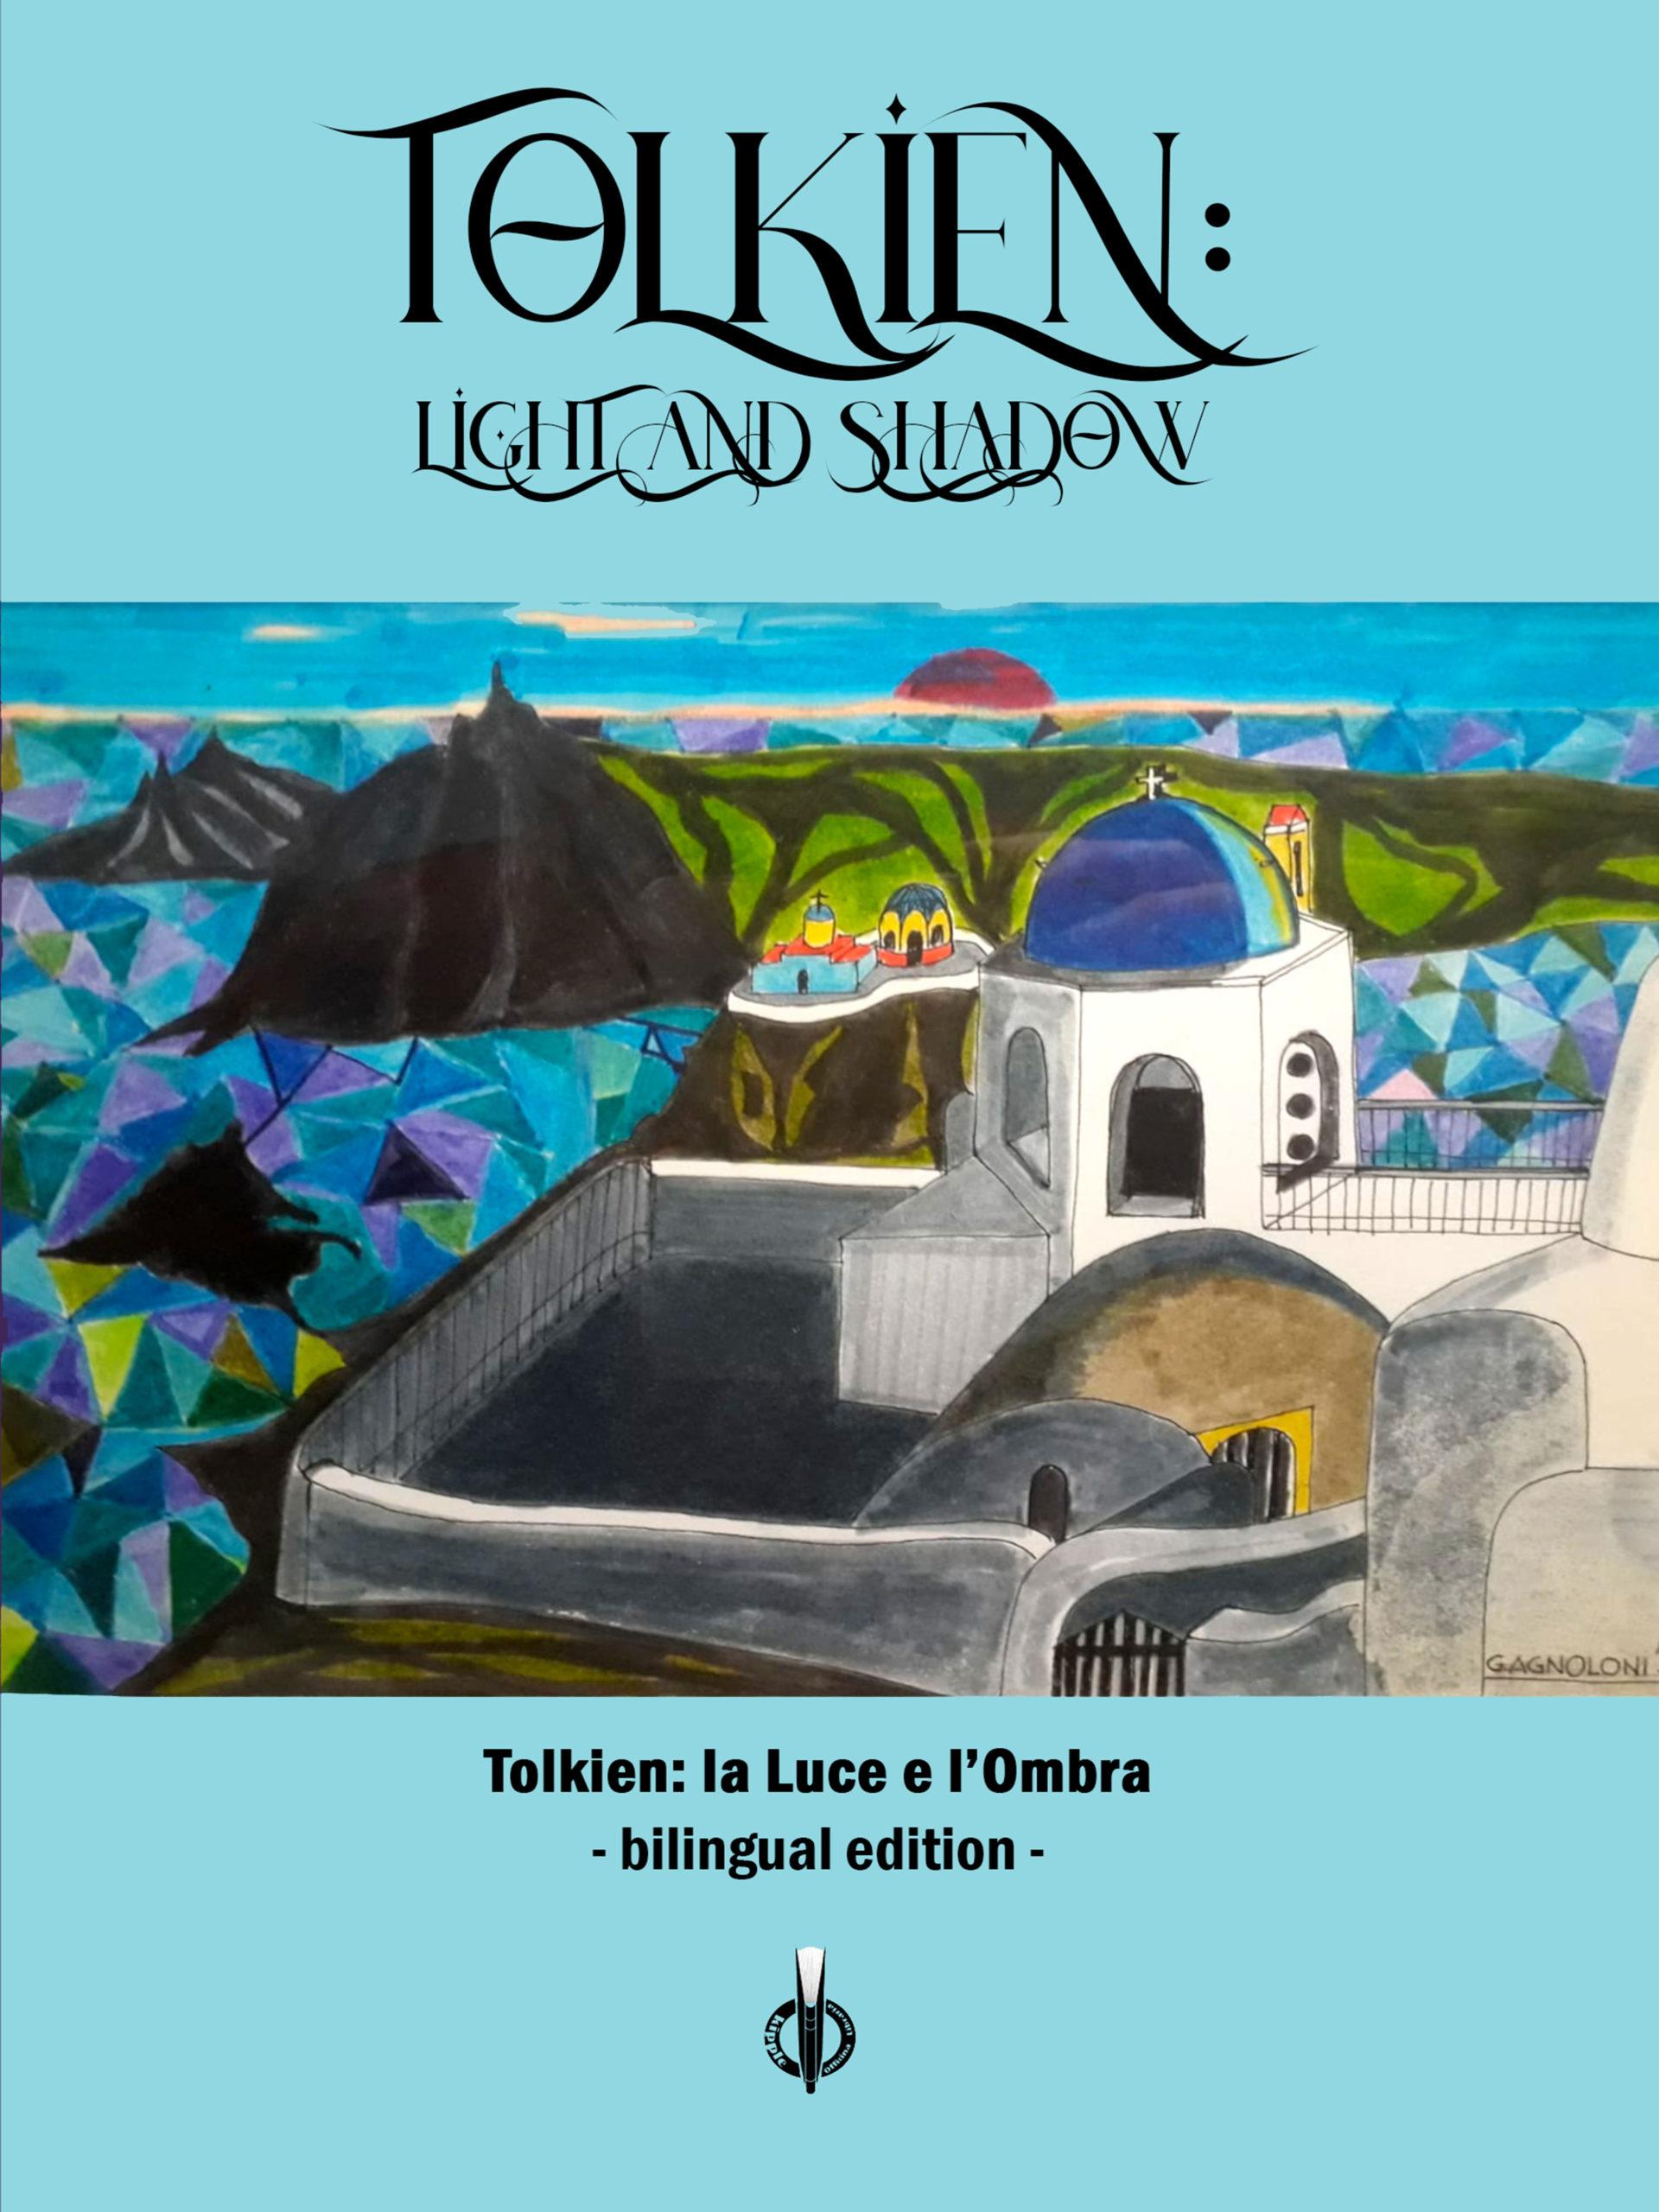 Tolkien: Light and Shadow – La Luce e l'Ombra di autori vari